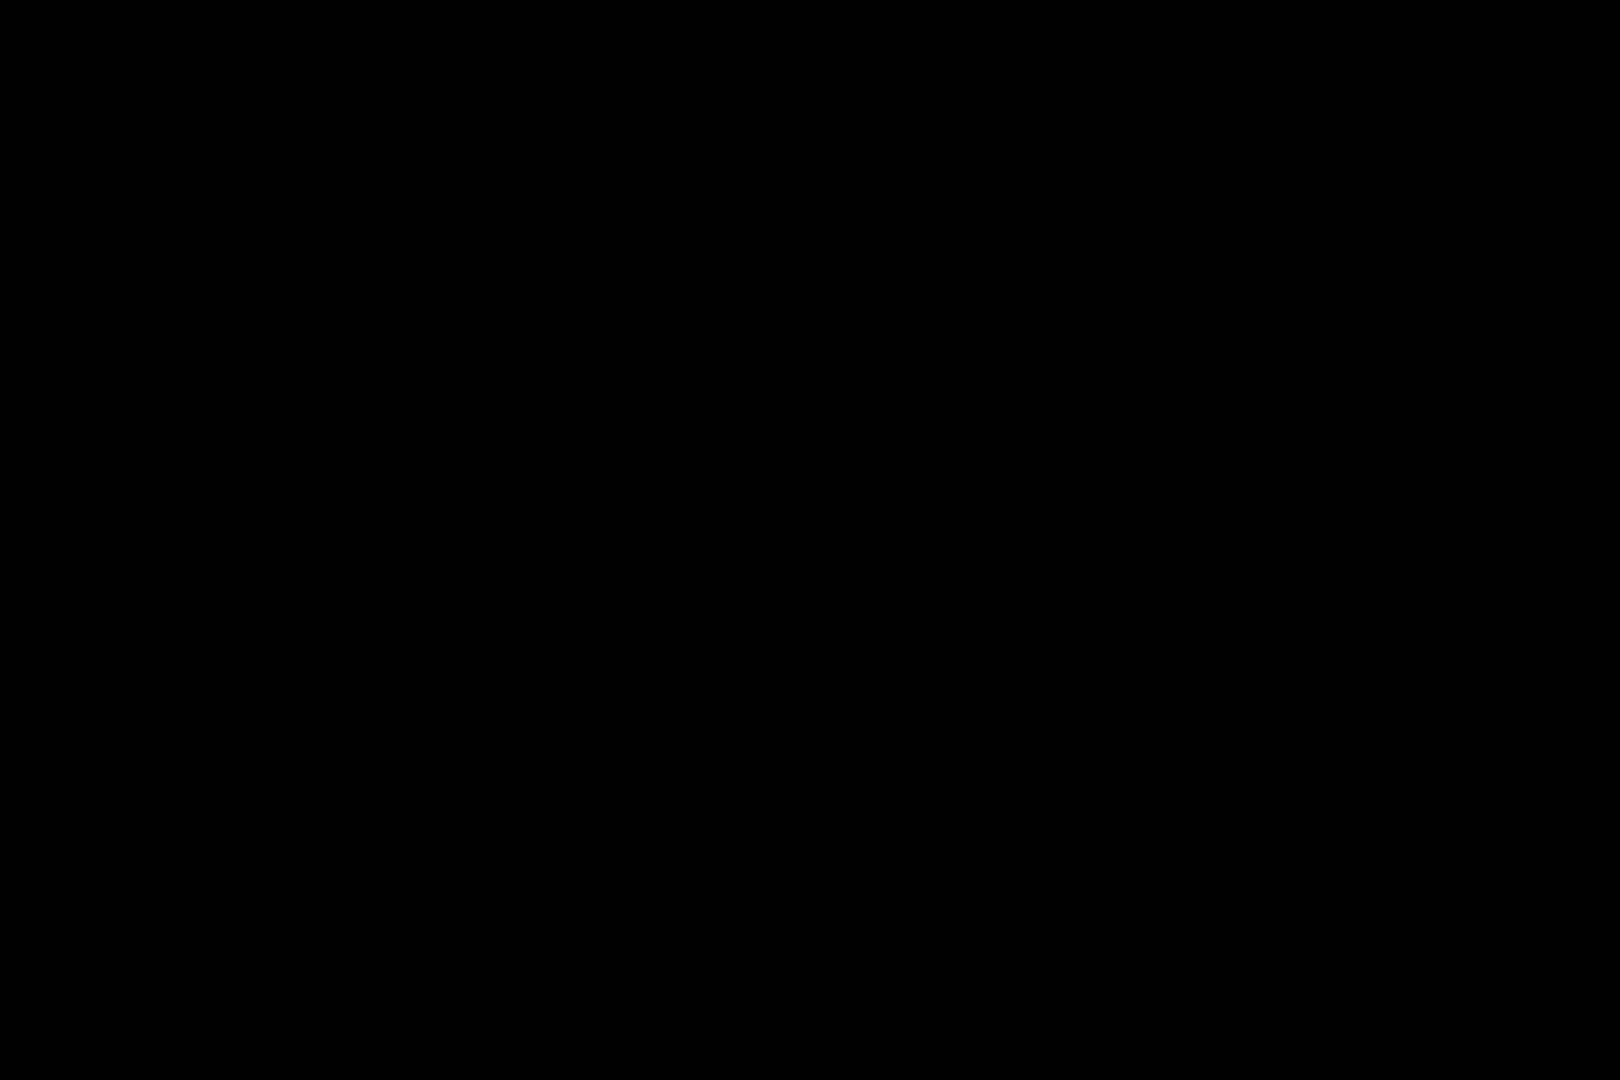 Aquaな露天風呂Vol.480 盗撮シリーズ | 露天風呂編  102PIX 21